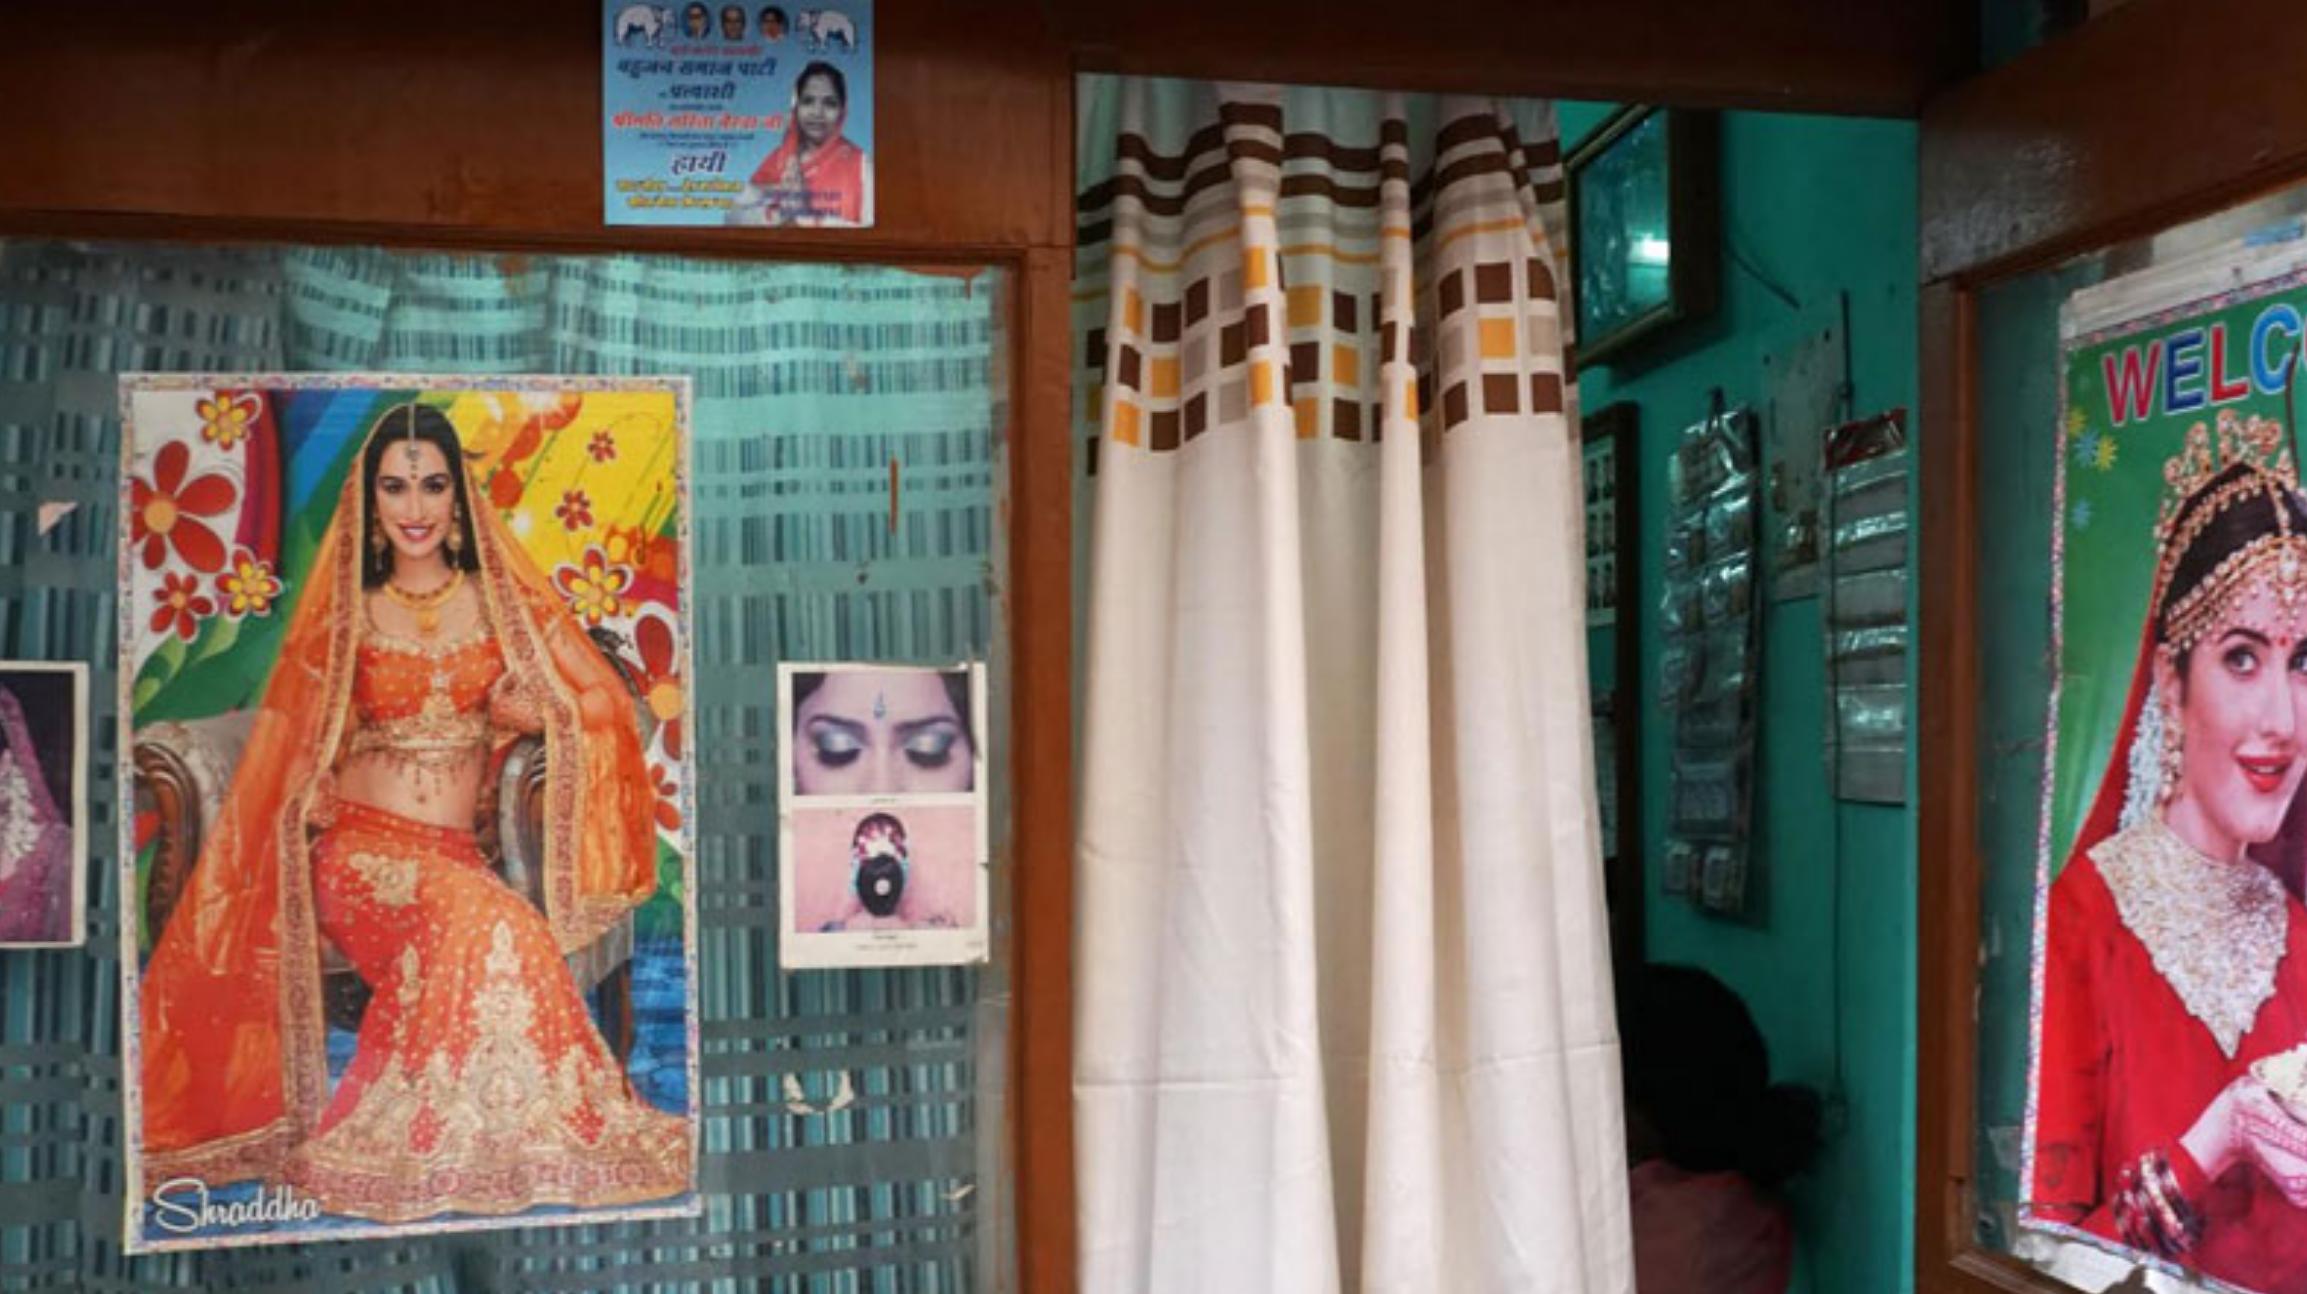 Priya Sen - Yeh Freedom Life.png